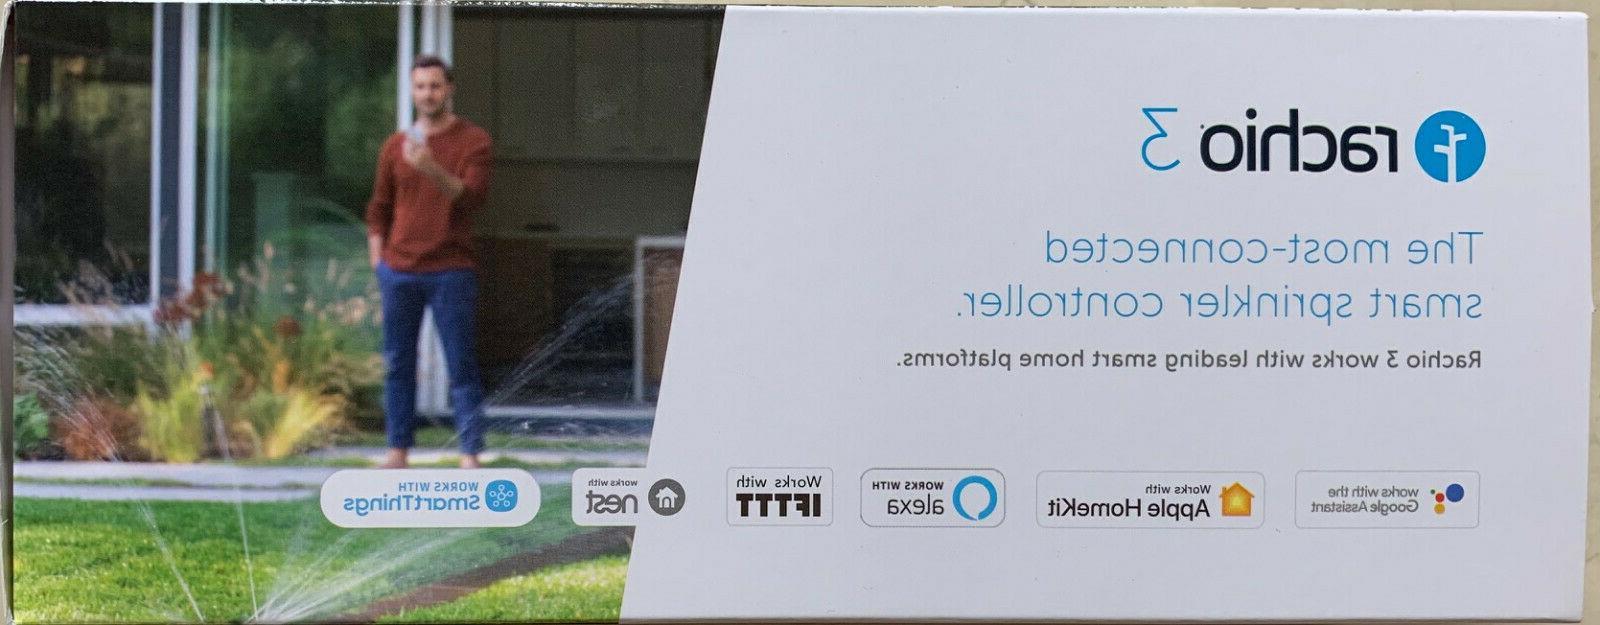 Rachio 3rd Generation Smart Sprinkler 12ZULW-C